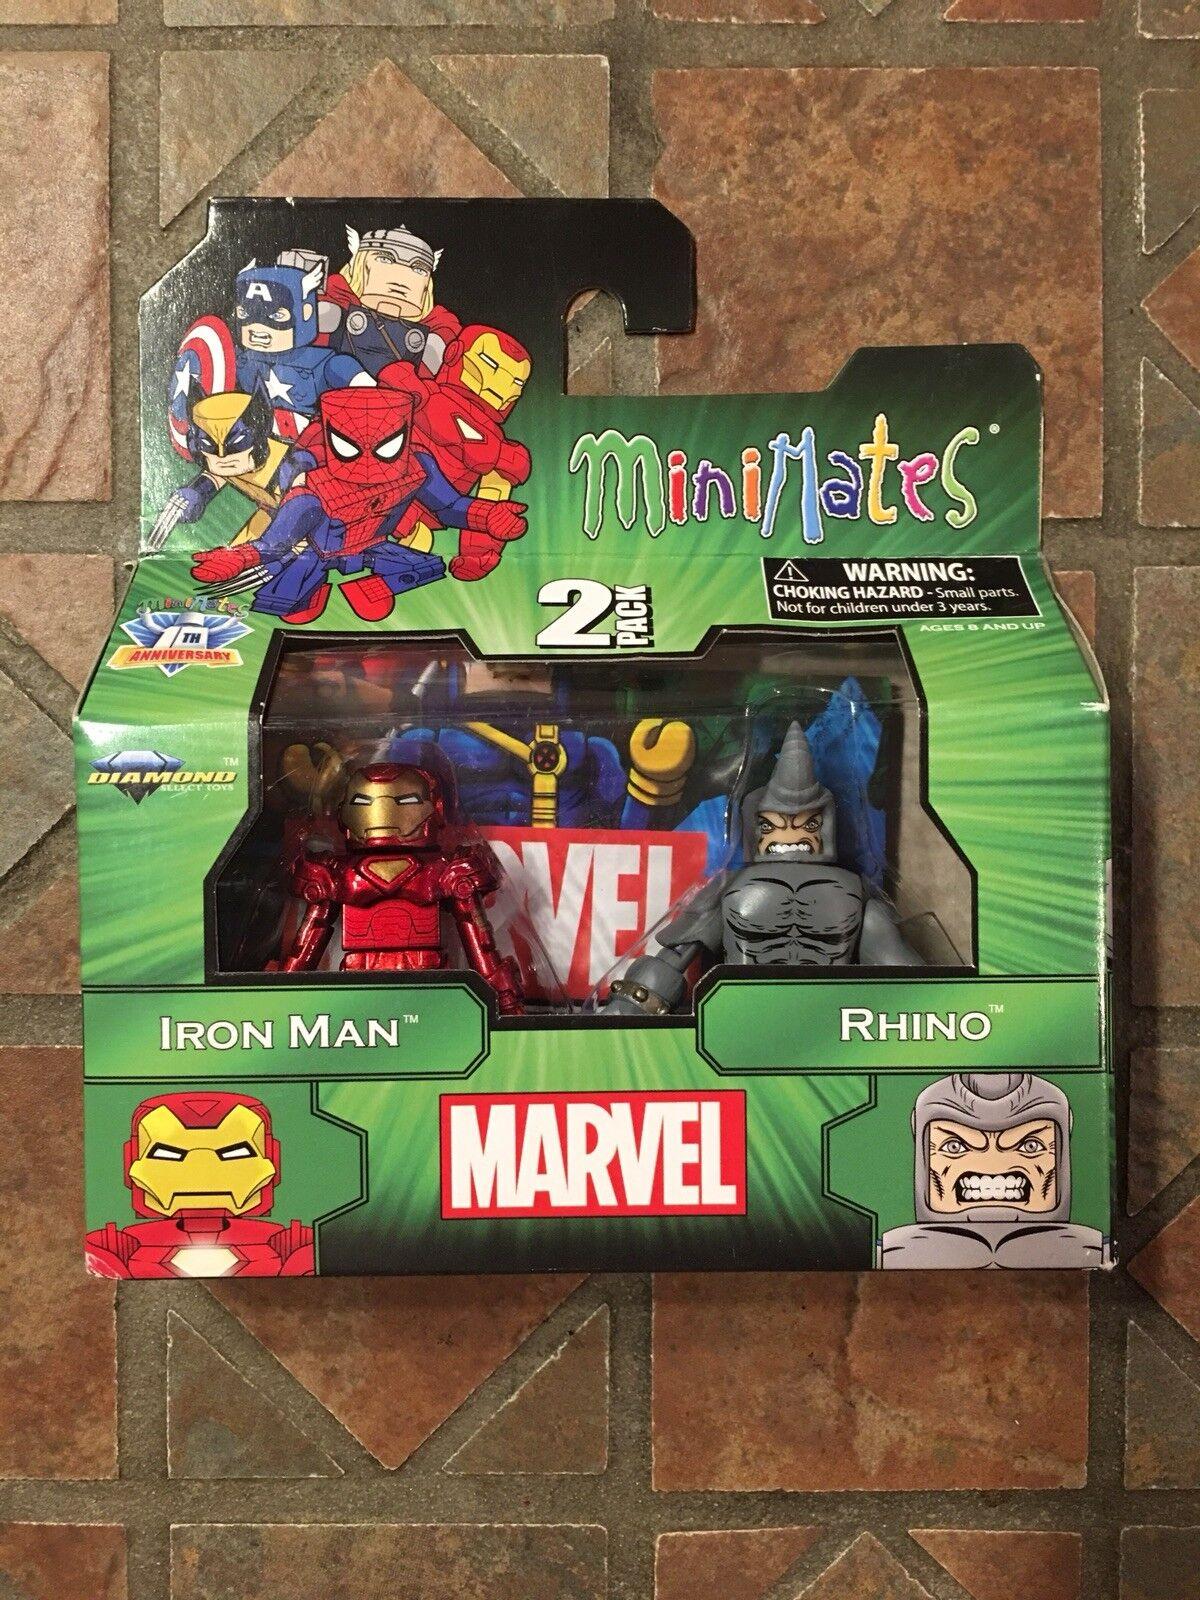 Marvel Minimates RHINO & IRON MAN TRU Wave 14 Avengers X-Men Stark Spider-man